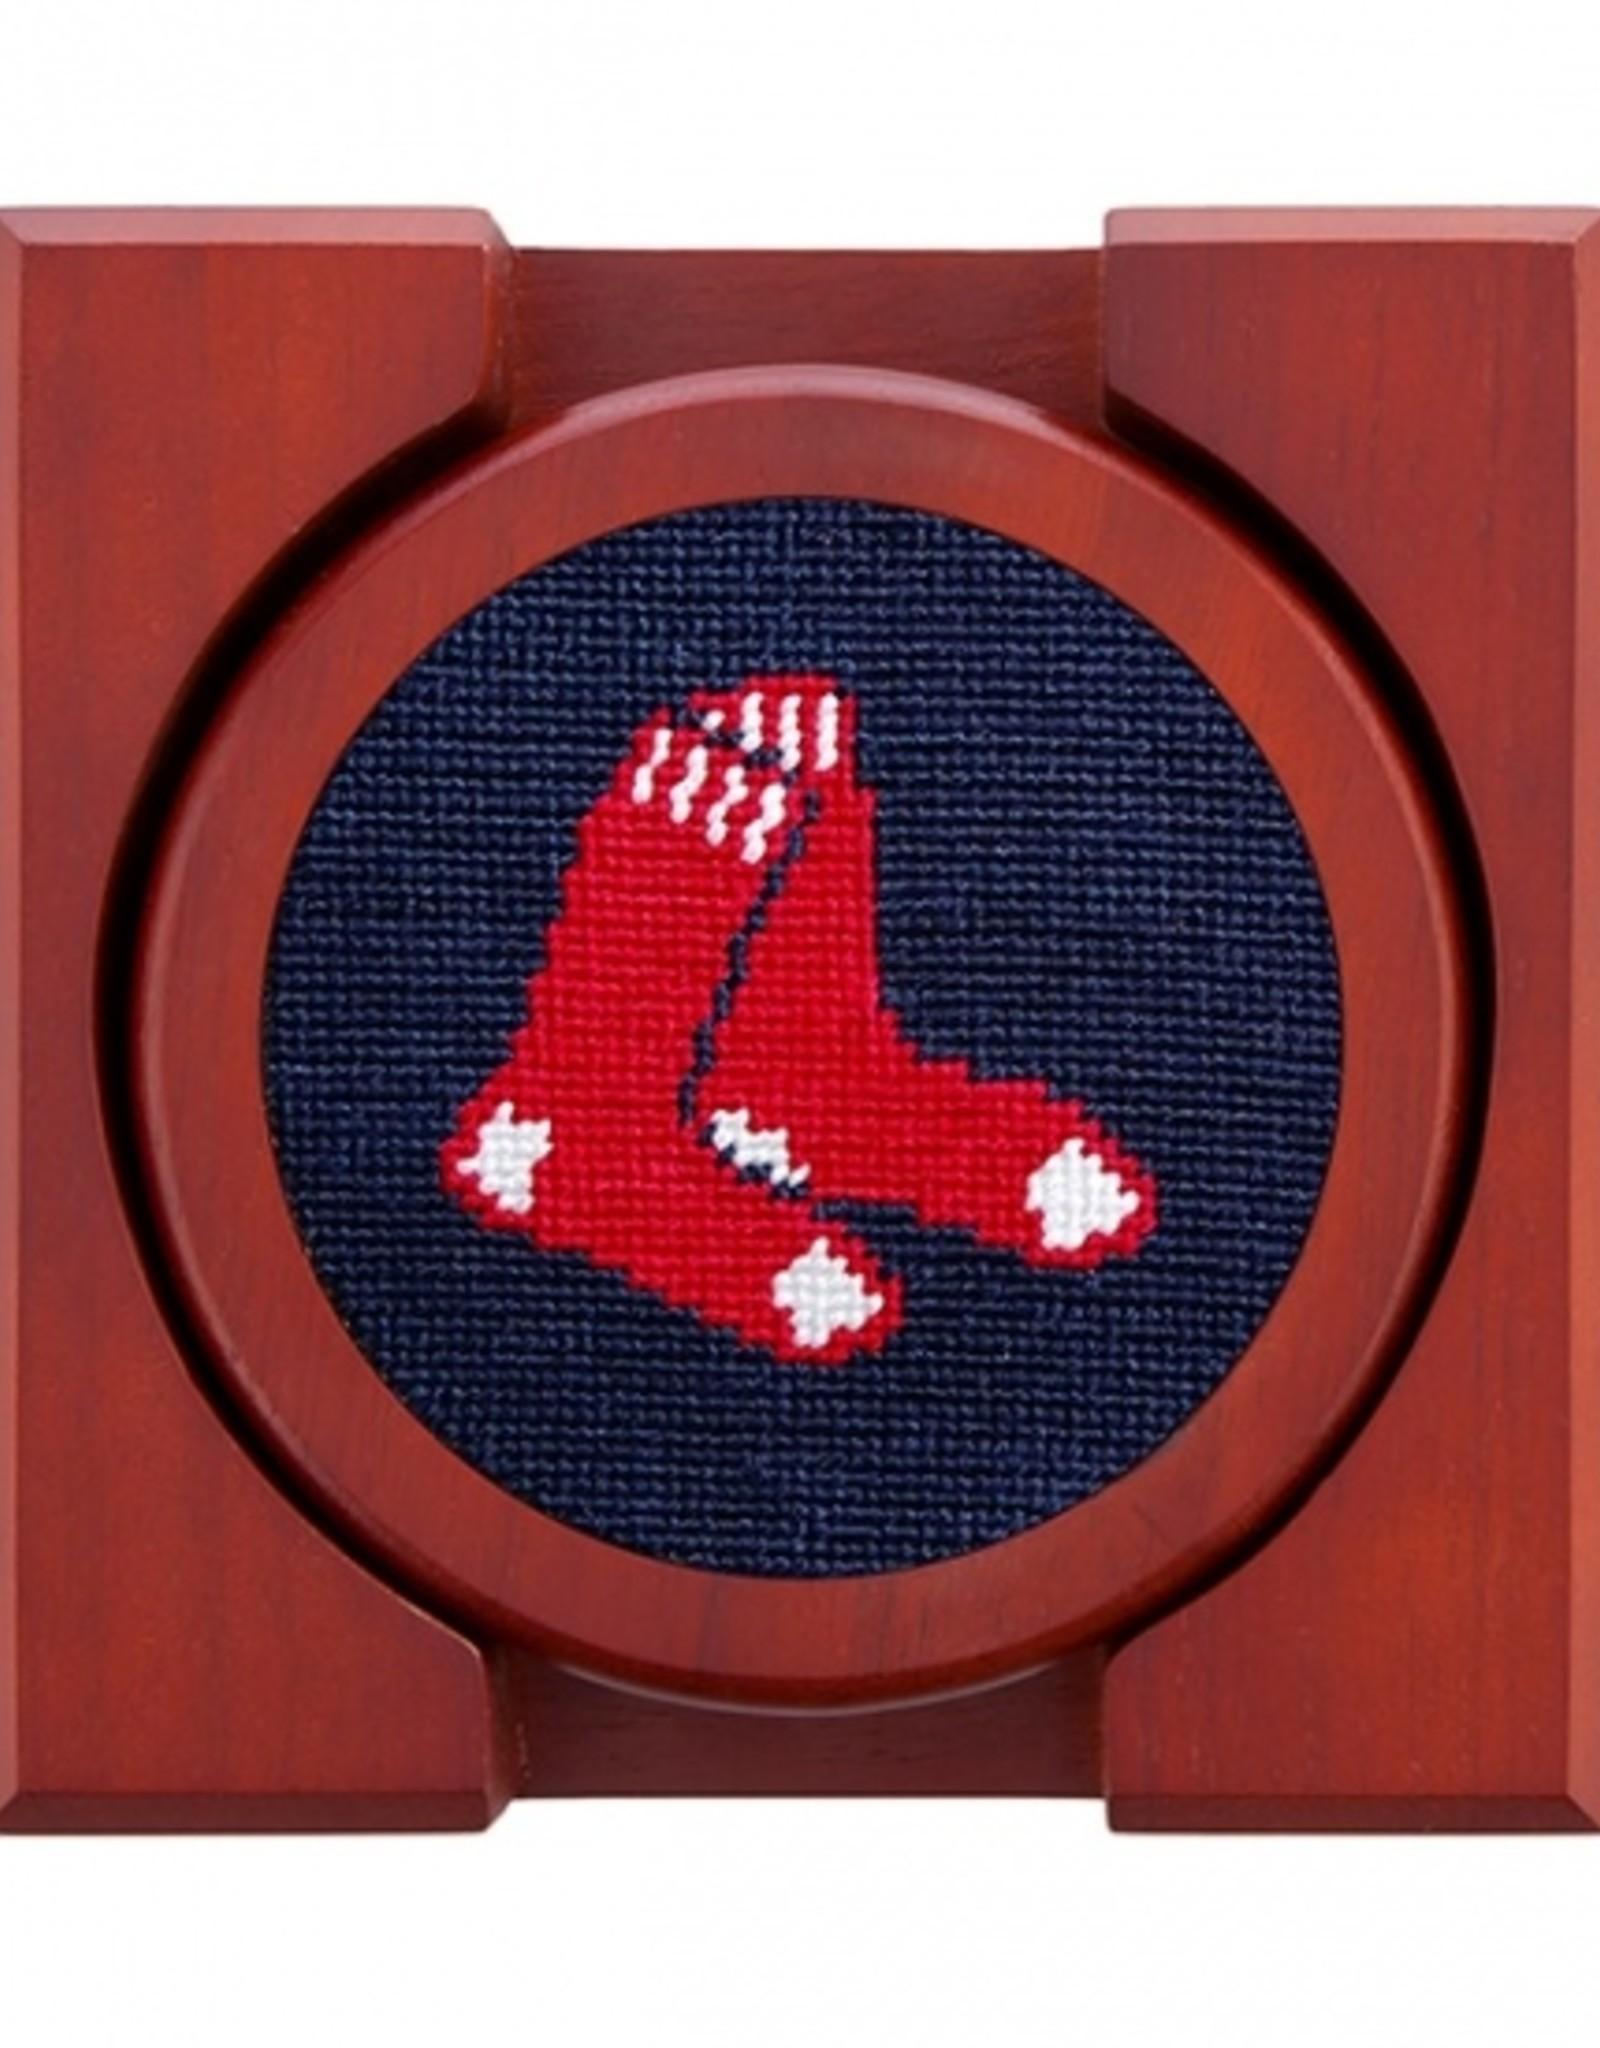 Smathers & Branson Smathers & Branson - Coaster Set of 4 Red Sox